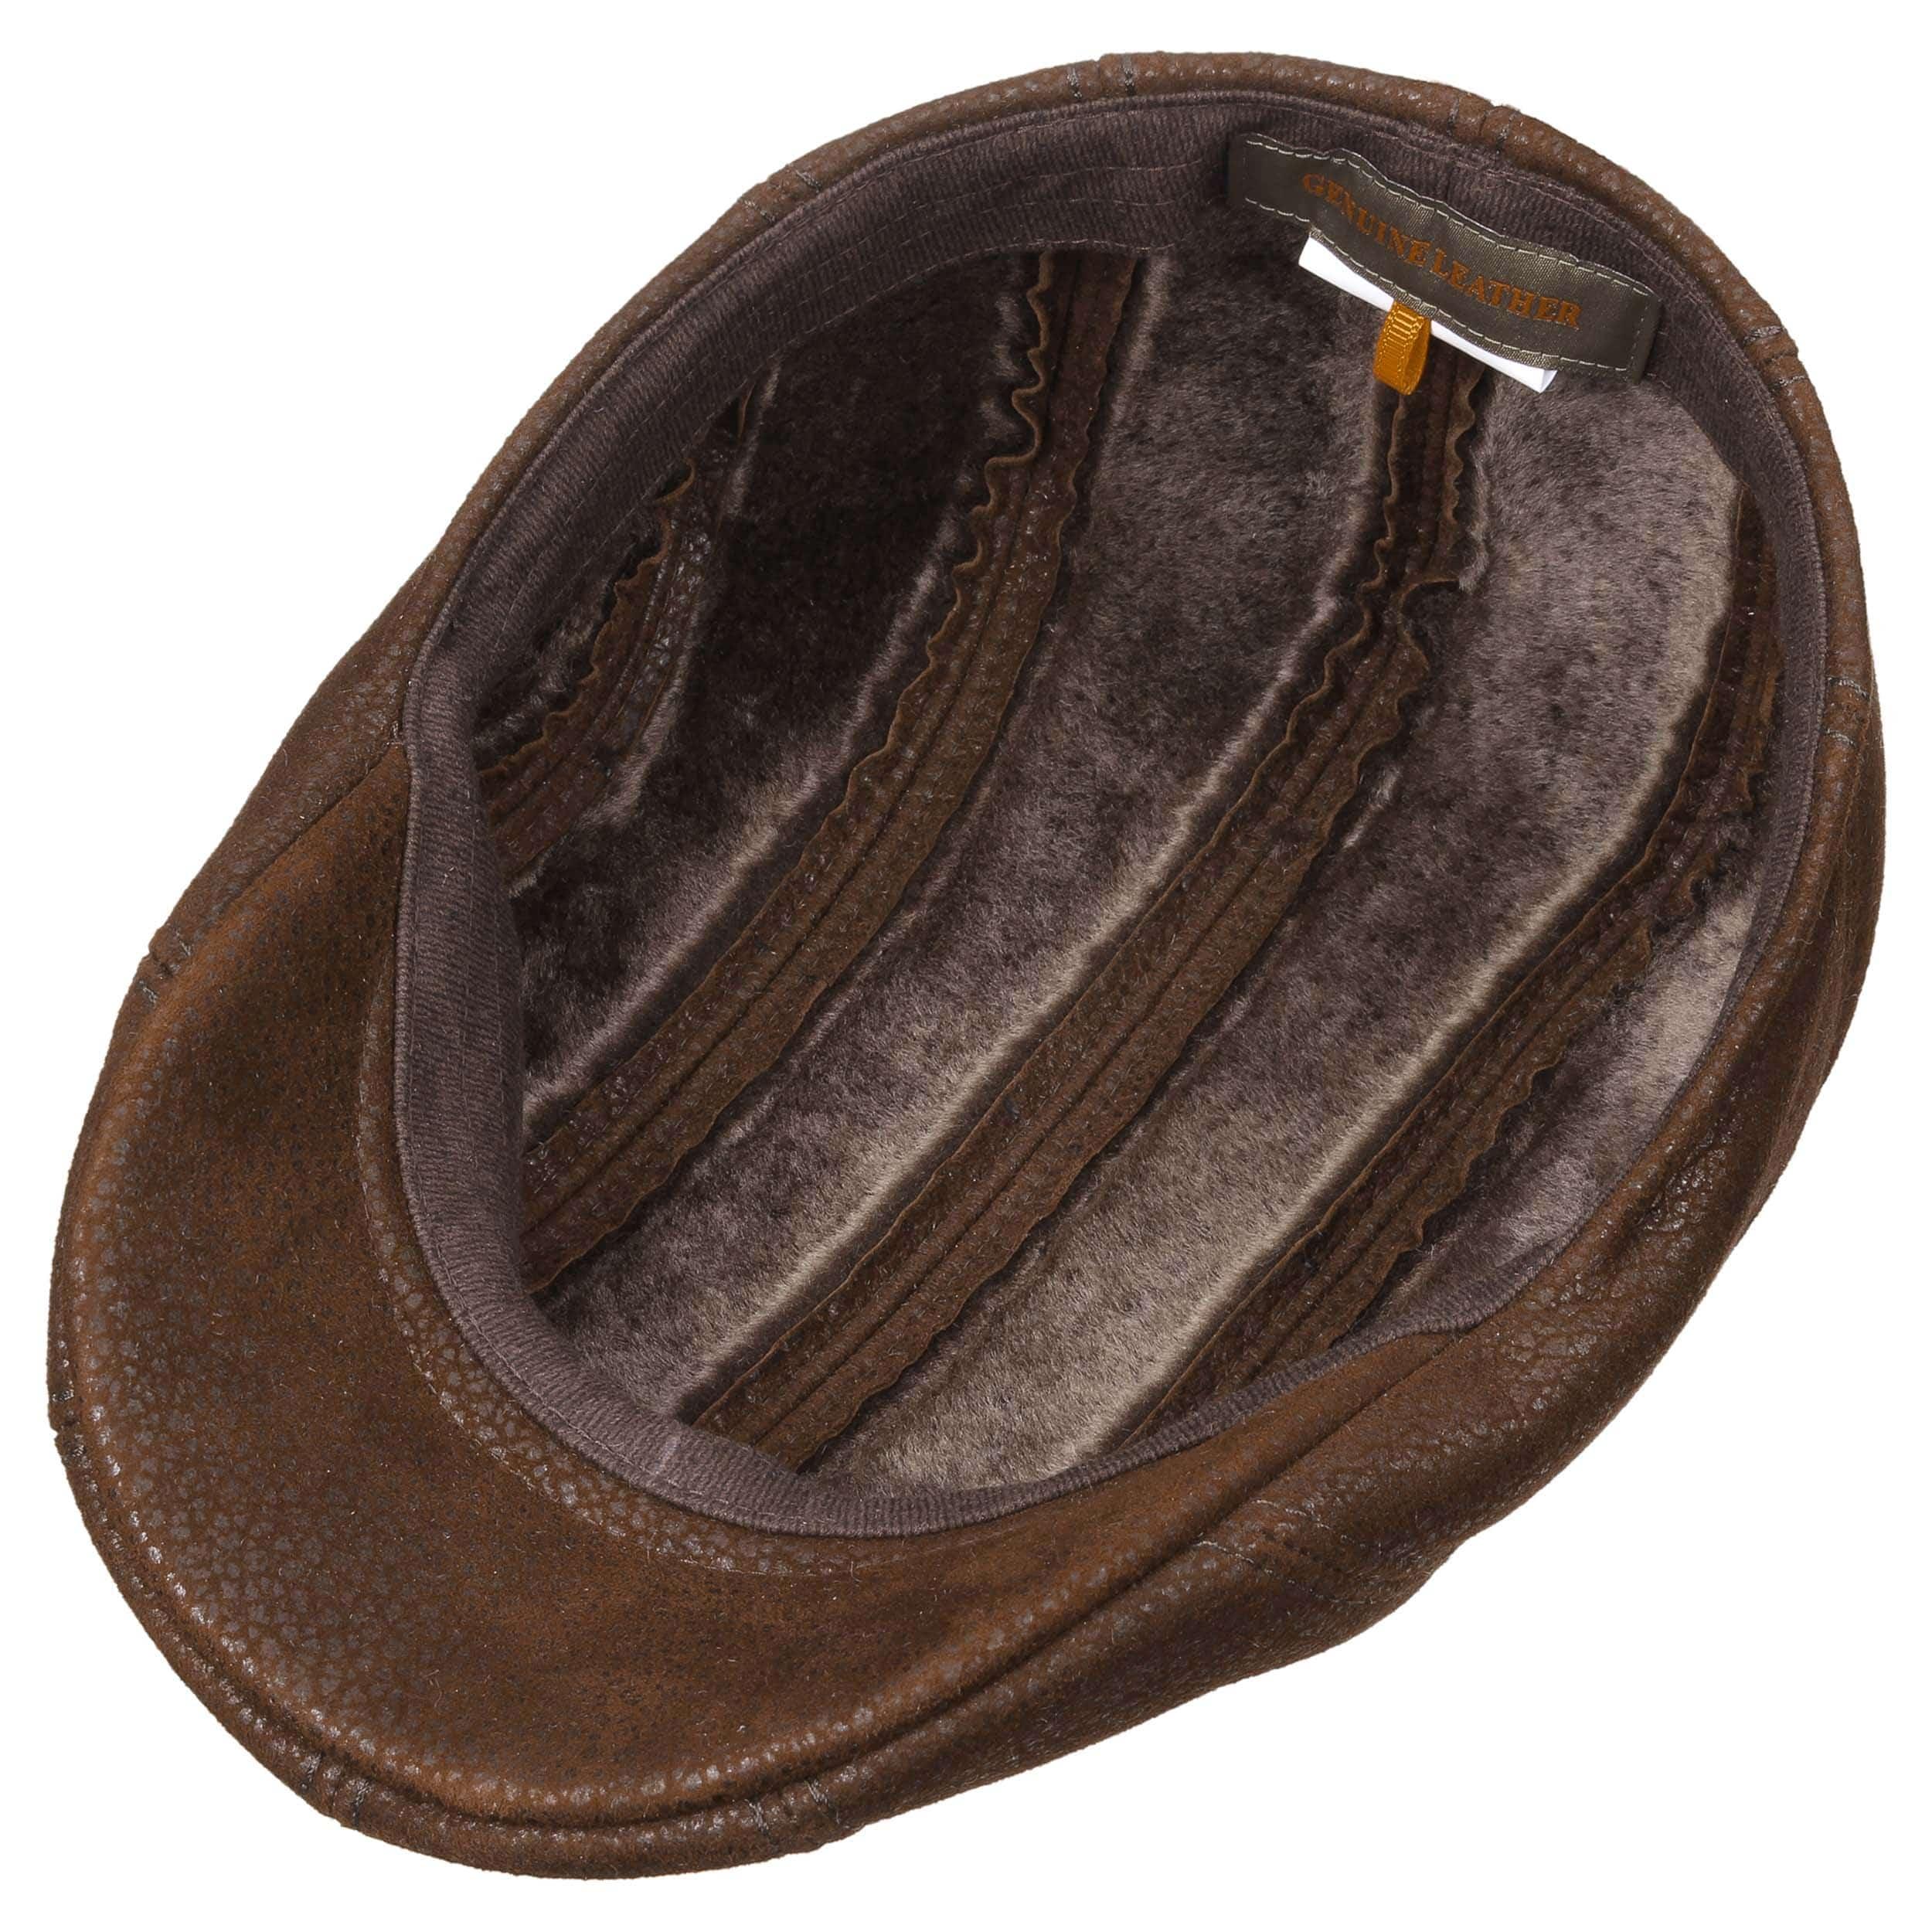 ... Madison Lamb Fur Inside Cap by Stetson - brown 2 ... 4545ca63cf3b